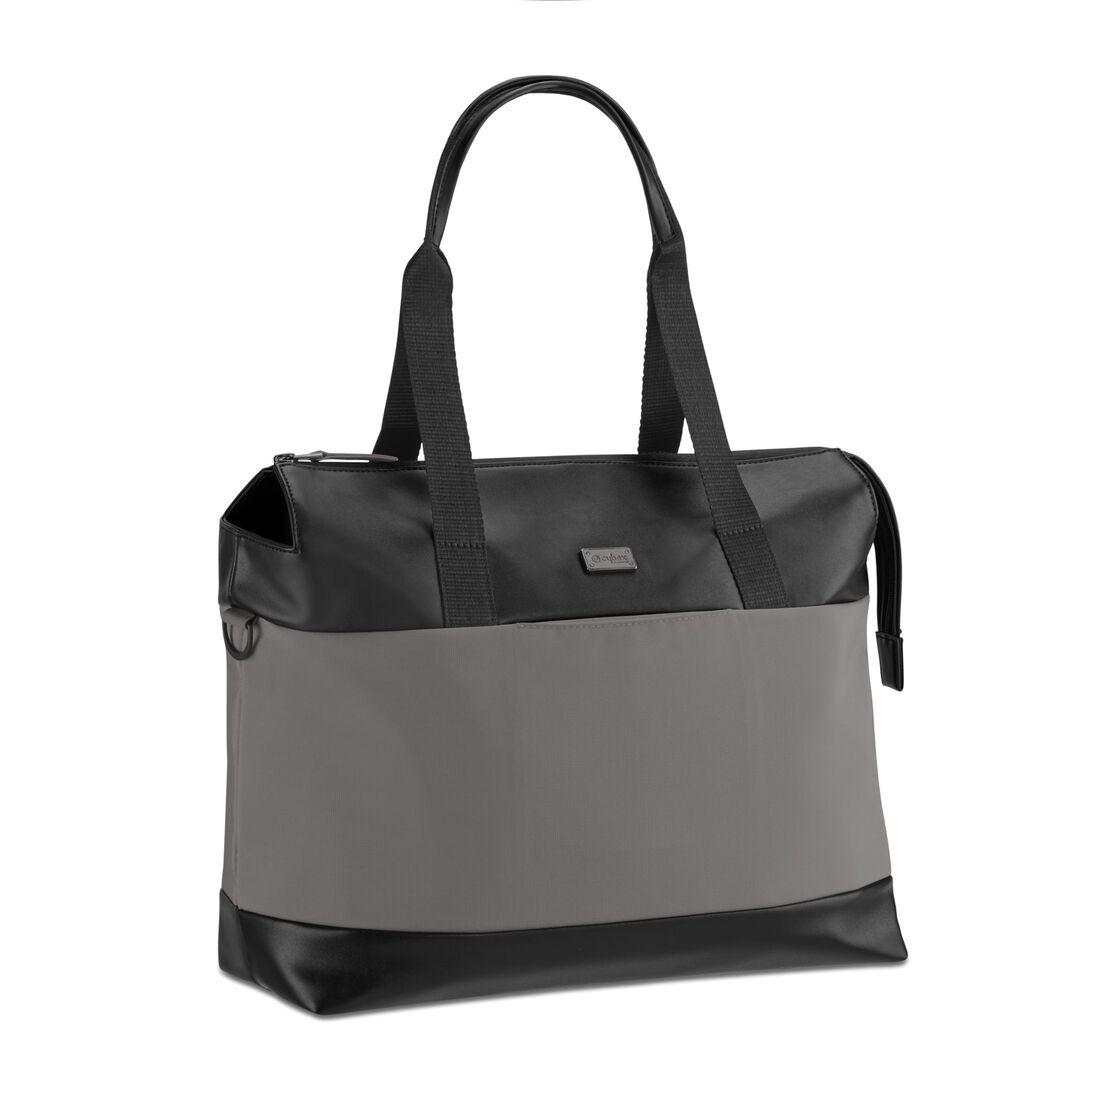 CYBEX Mios Changing Bag - Soho Grey in Soho Grey large image number 1